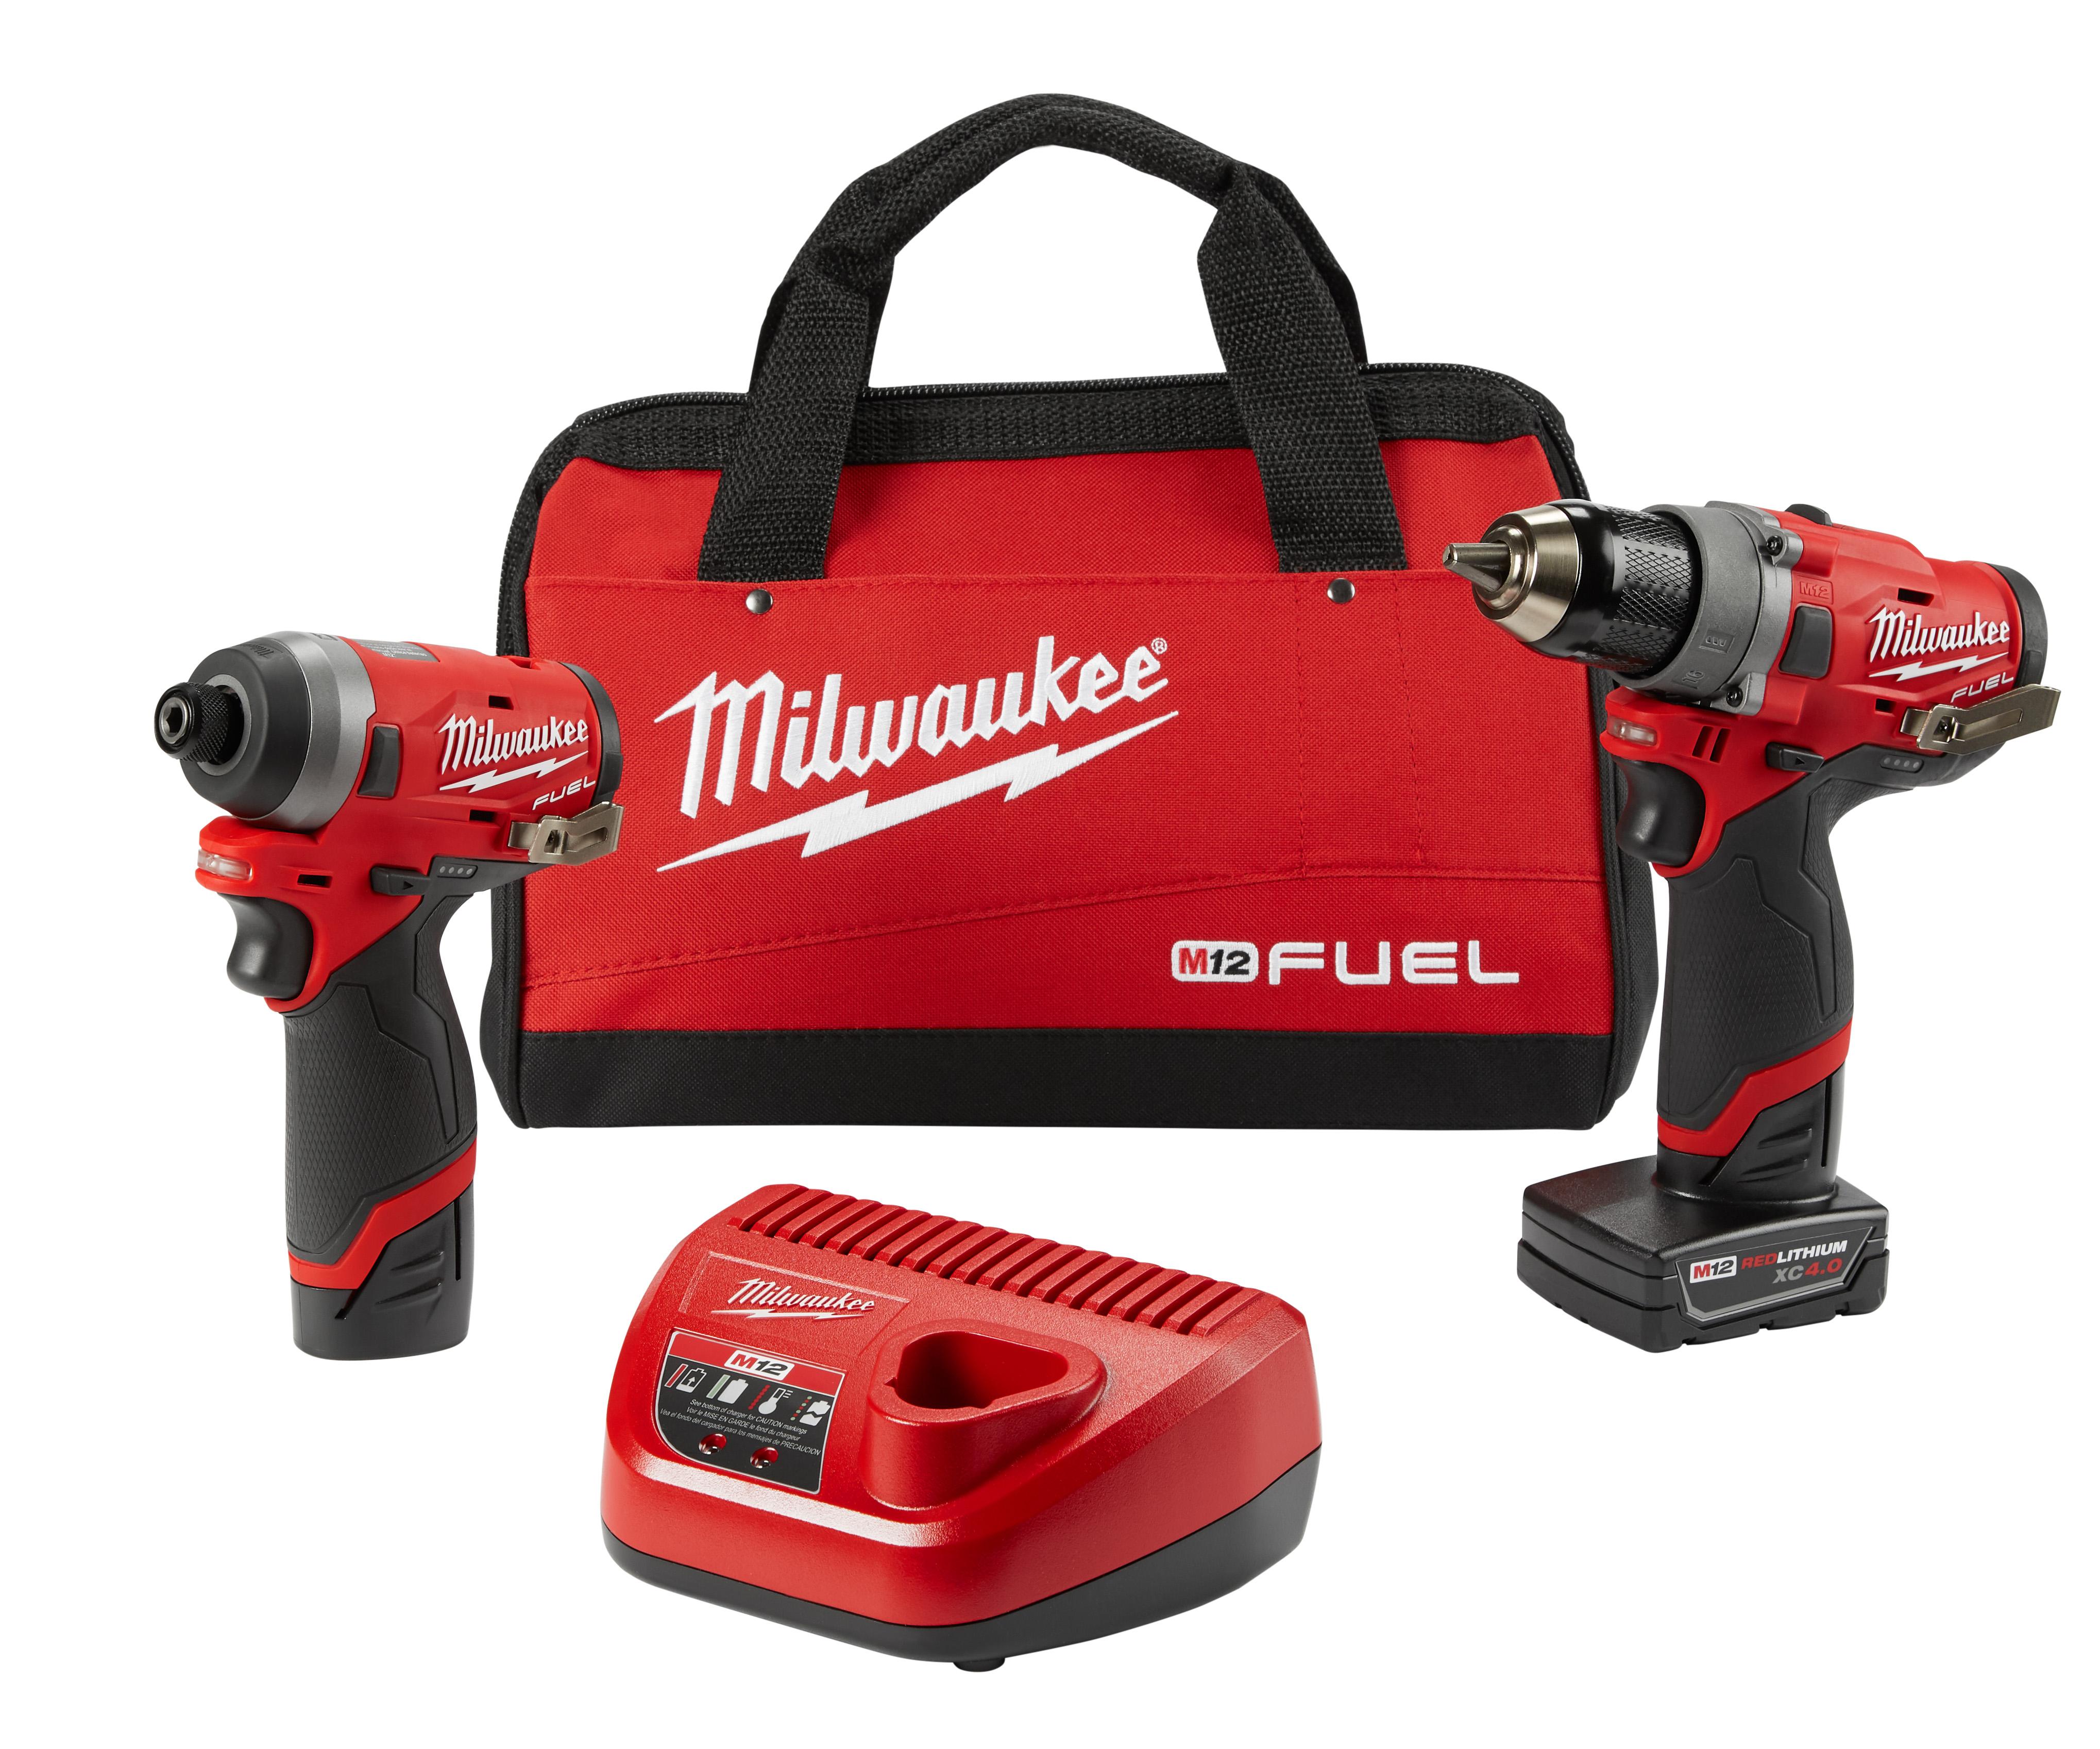 MILW 2596-22 M12 FUEL 2-Tool Combo Kit 1/2